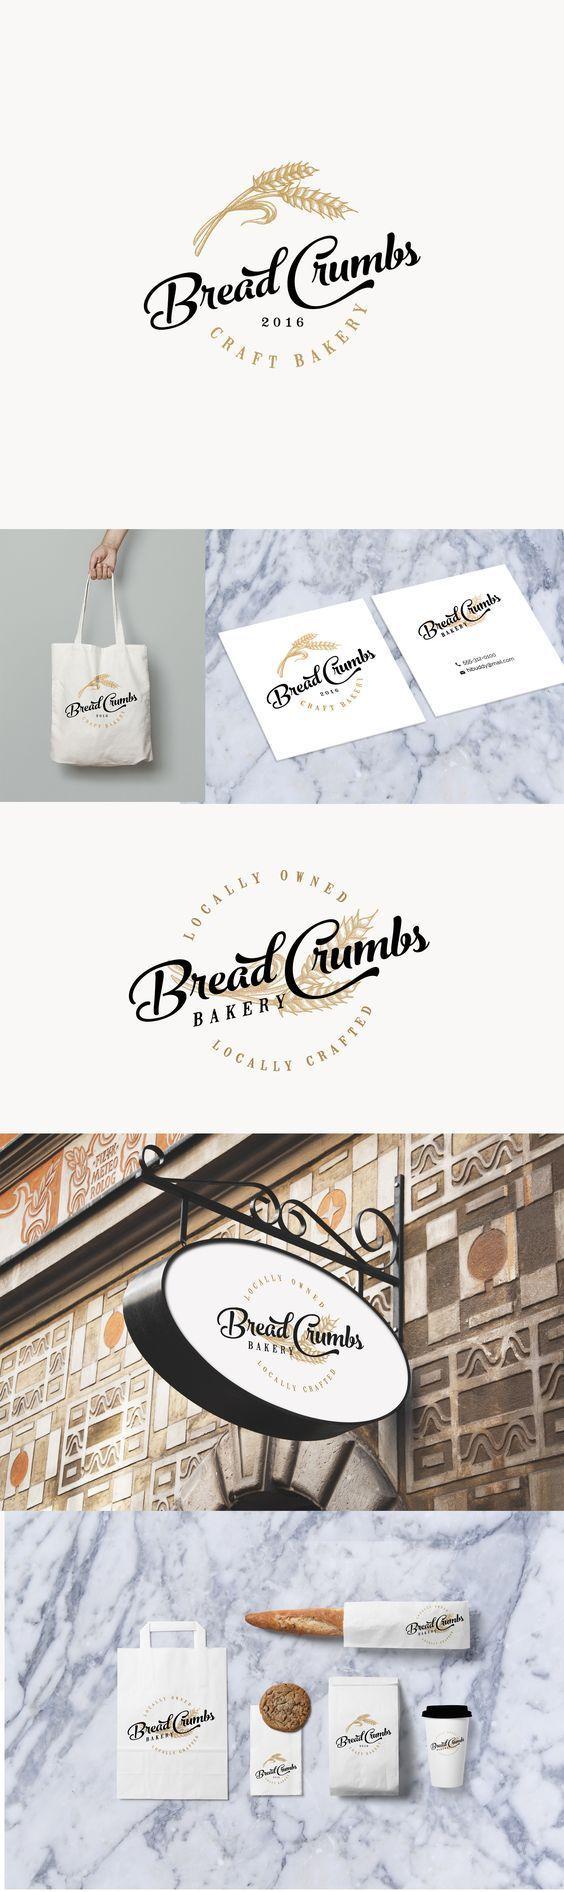 Bread Crumbs Bakery Branding by CBT | Fivestar Branding Agency – Design and Branding Agency & Curated Inspiration Gallery